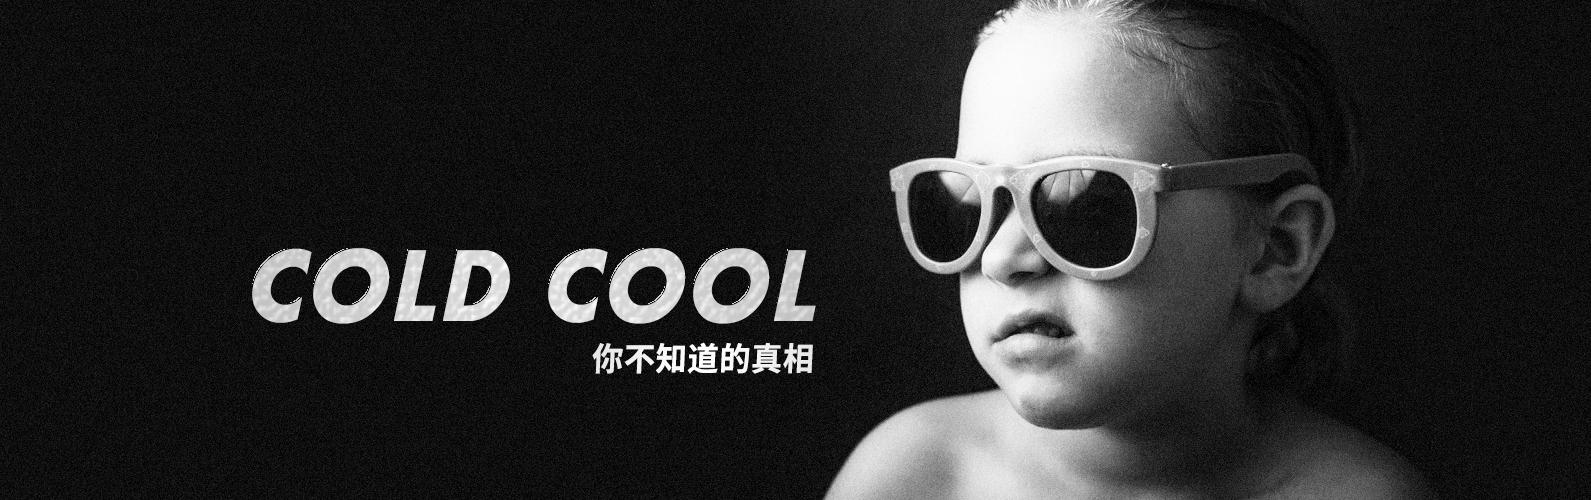 ColdCool:美苏总统曾商讨如果外星人入侵怎么办 180702